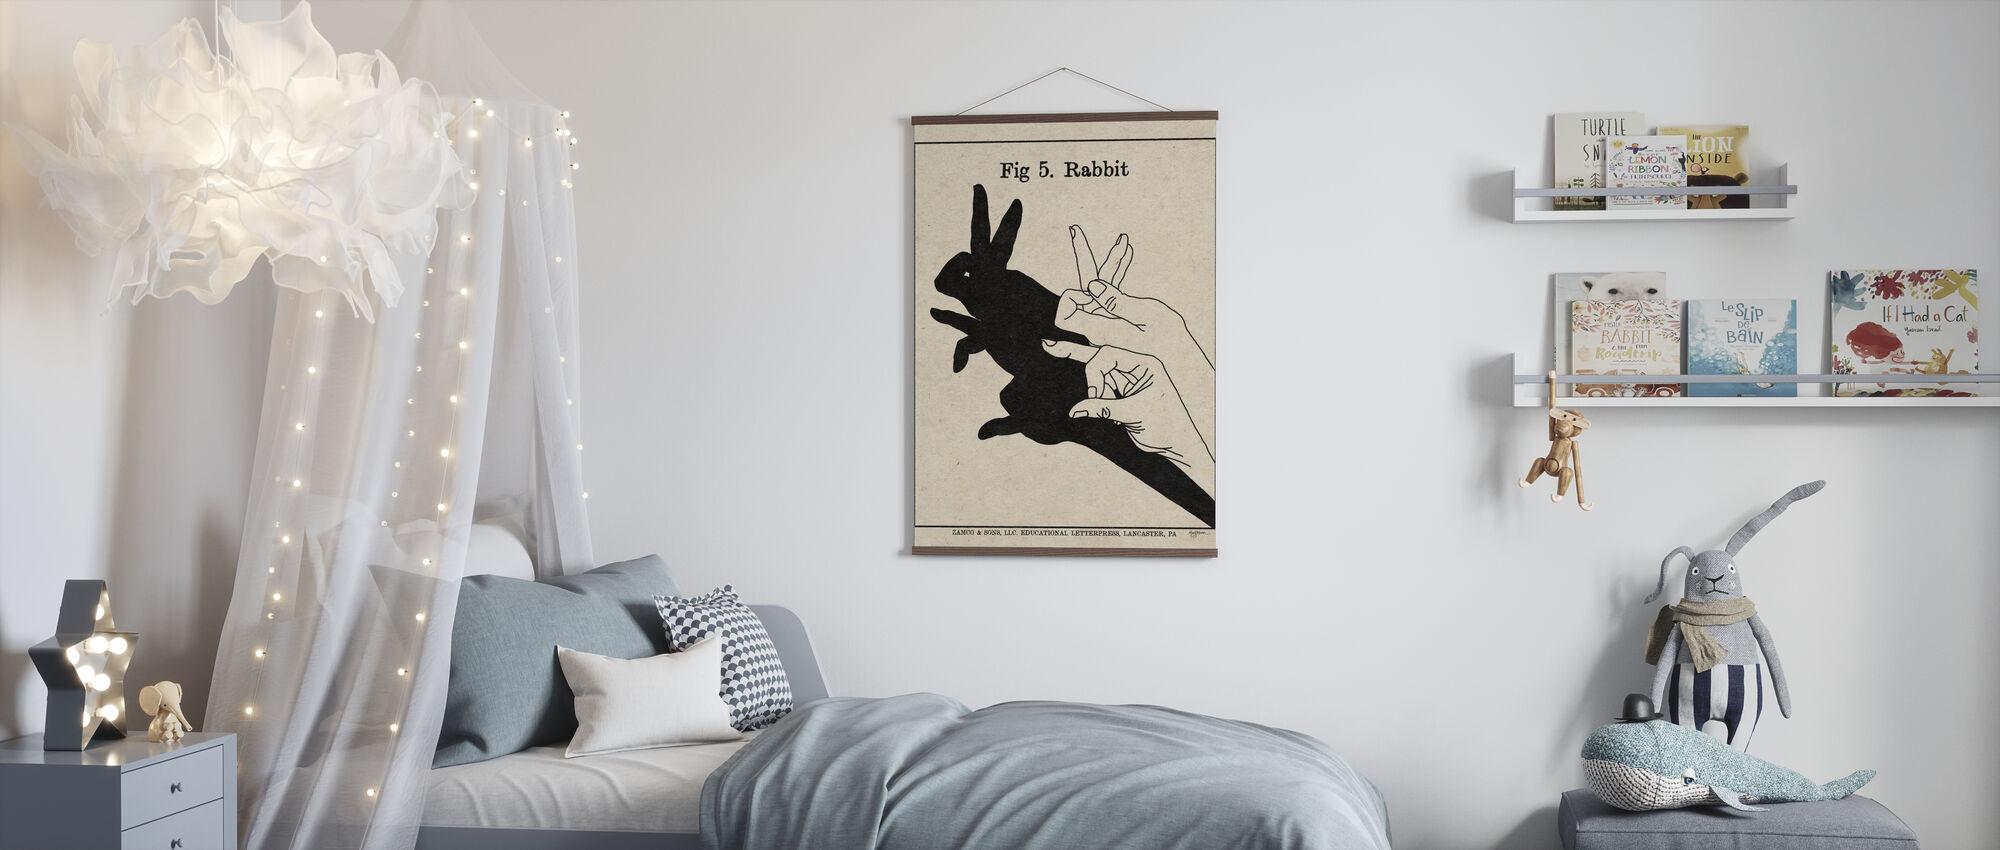 The Art of Shadows - Rabbit - Poster - Kids Room